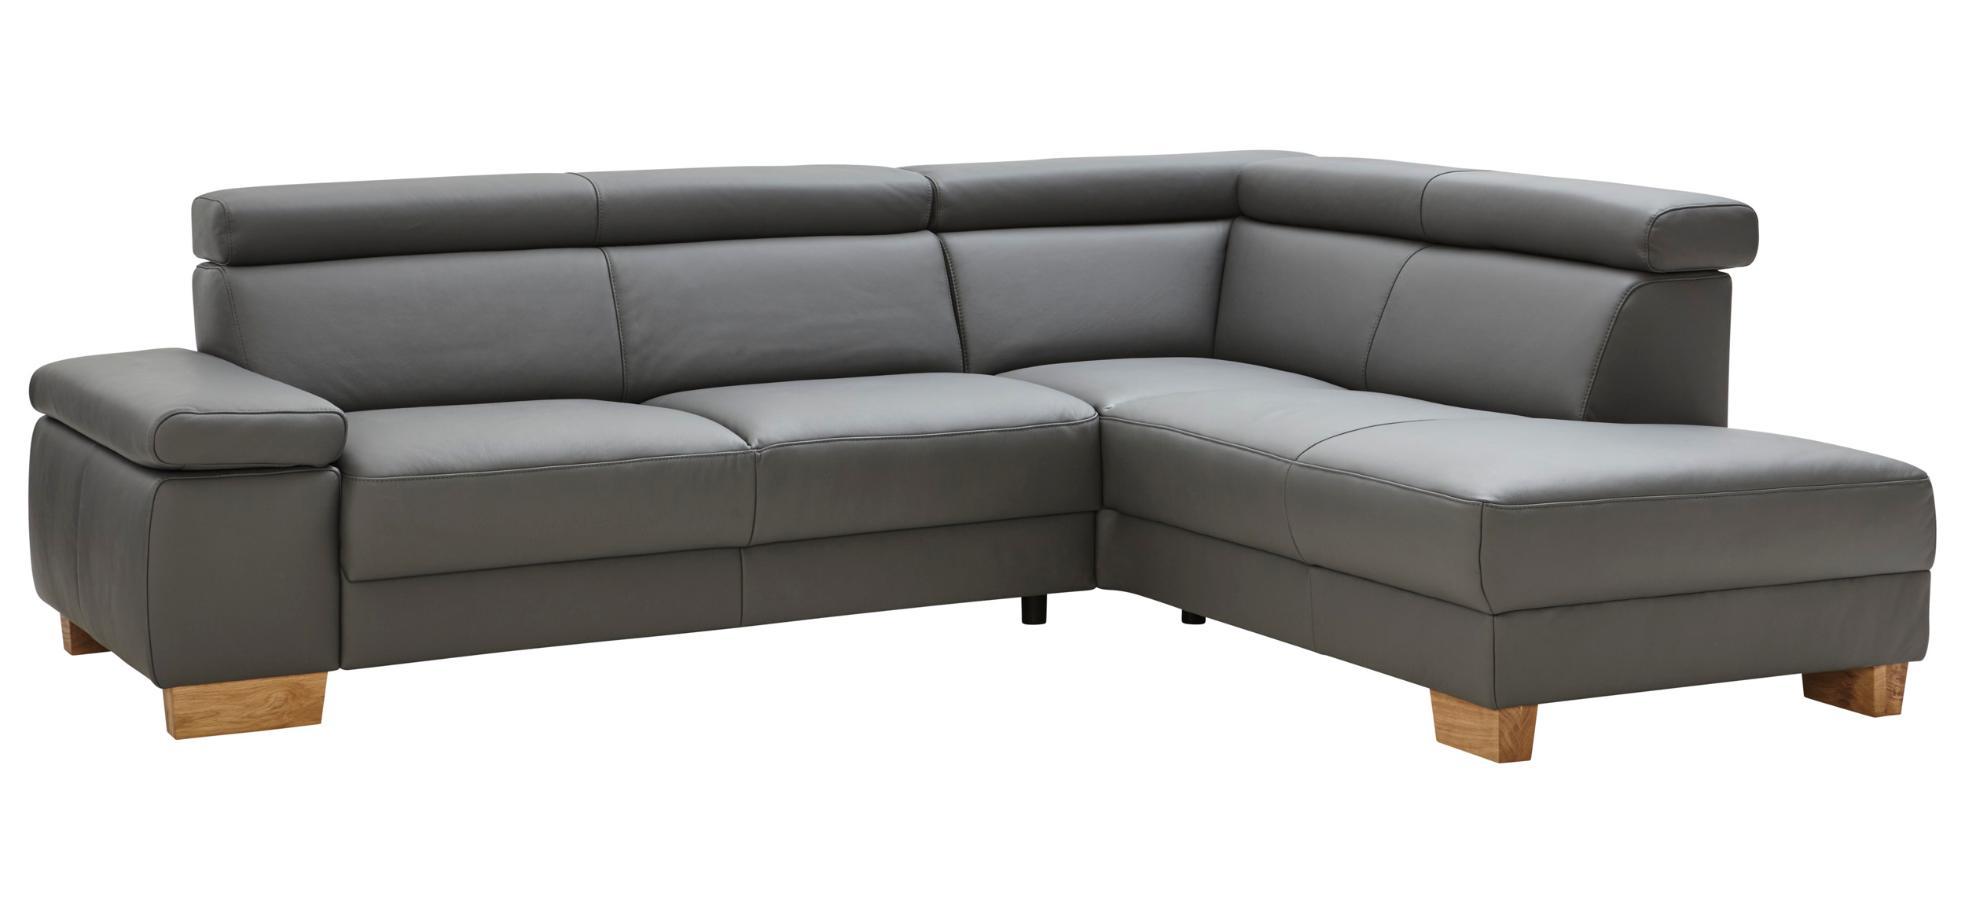 Full Size of Natura Sofa Couch Brooklyn Pasadena Livingston Newport Denver Home Kansas Love Kaufen Gebraucht Polsterecke Philadelphia Krause Company Big Mit Schlaffunktion Sofa Natura Sofa